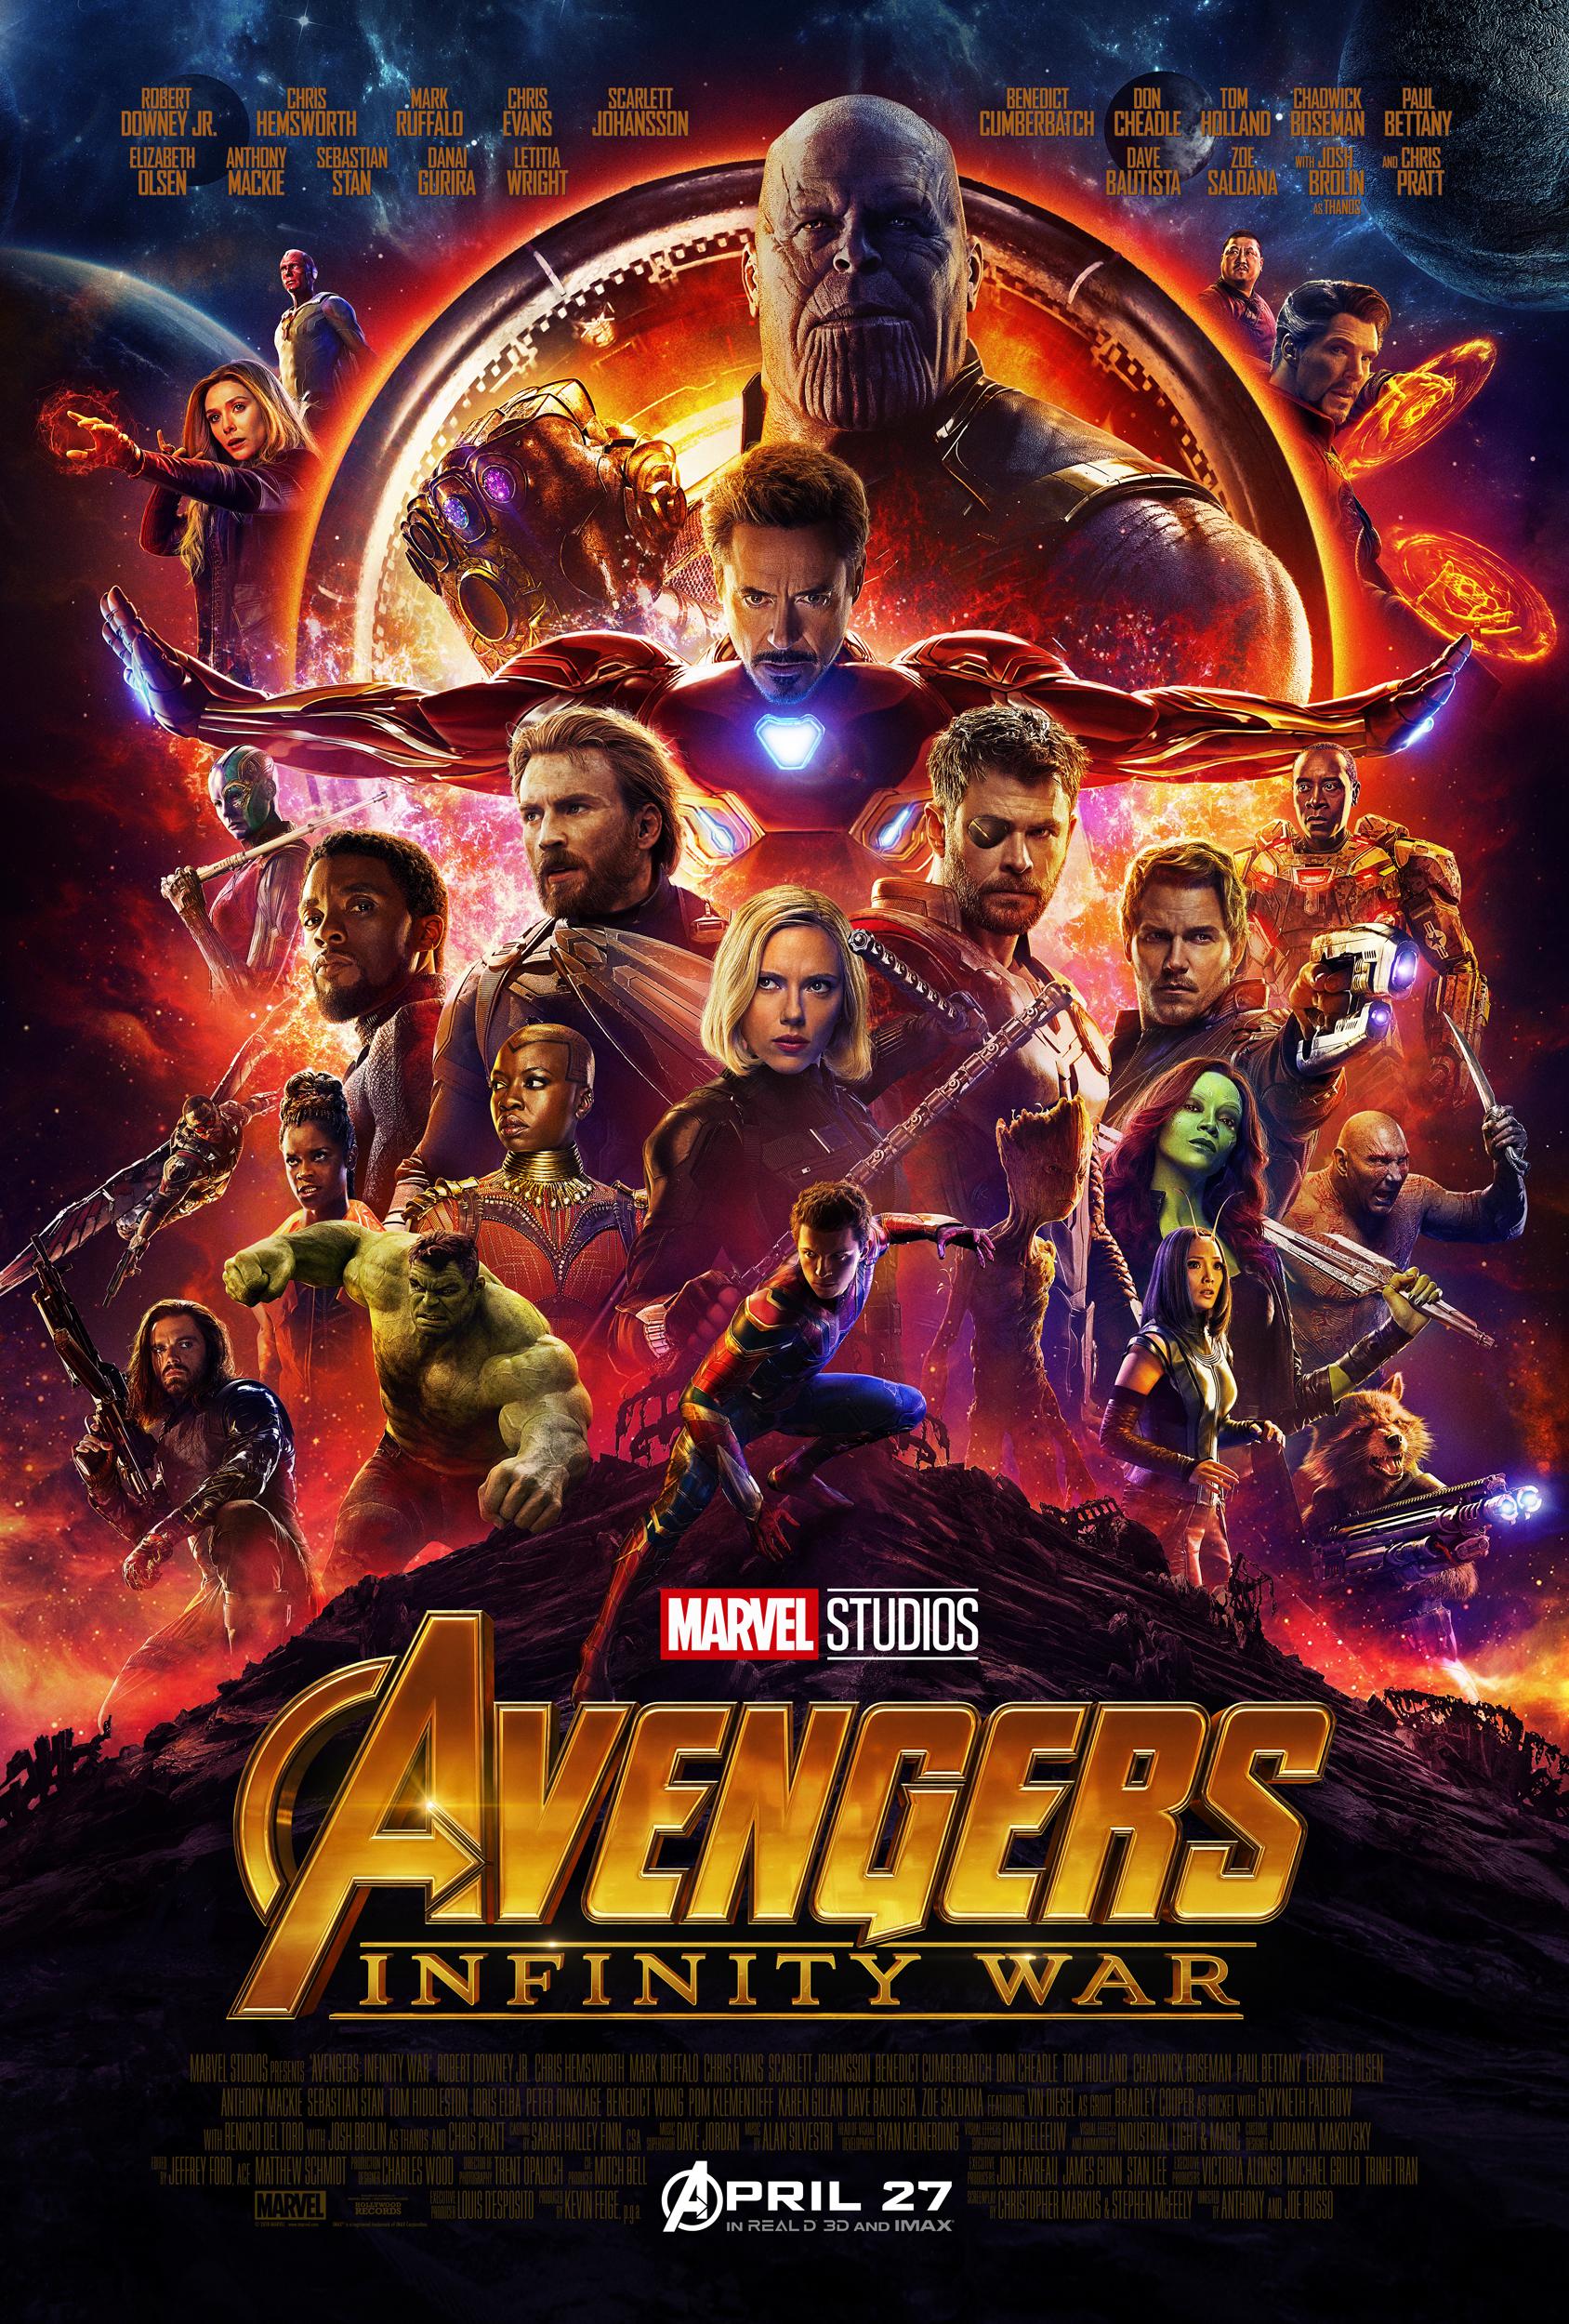 Download Scott Lang Infinity War Wallpaper - latest?cb\u003d20180316141550  Perfect Image Reference_969320 .jpeg/revision/latest?cb\u003d20180316141550